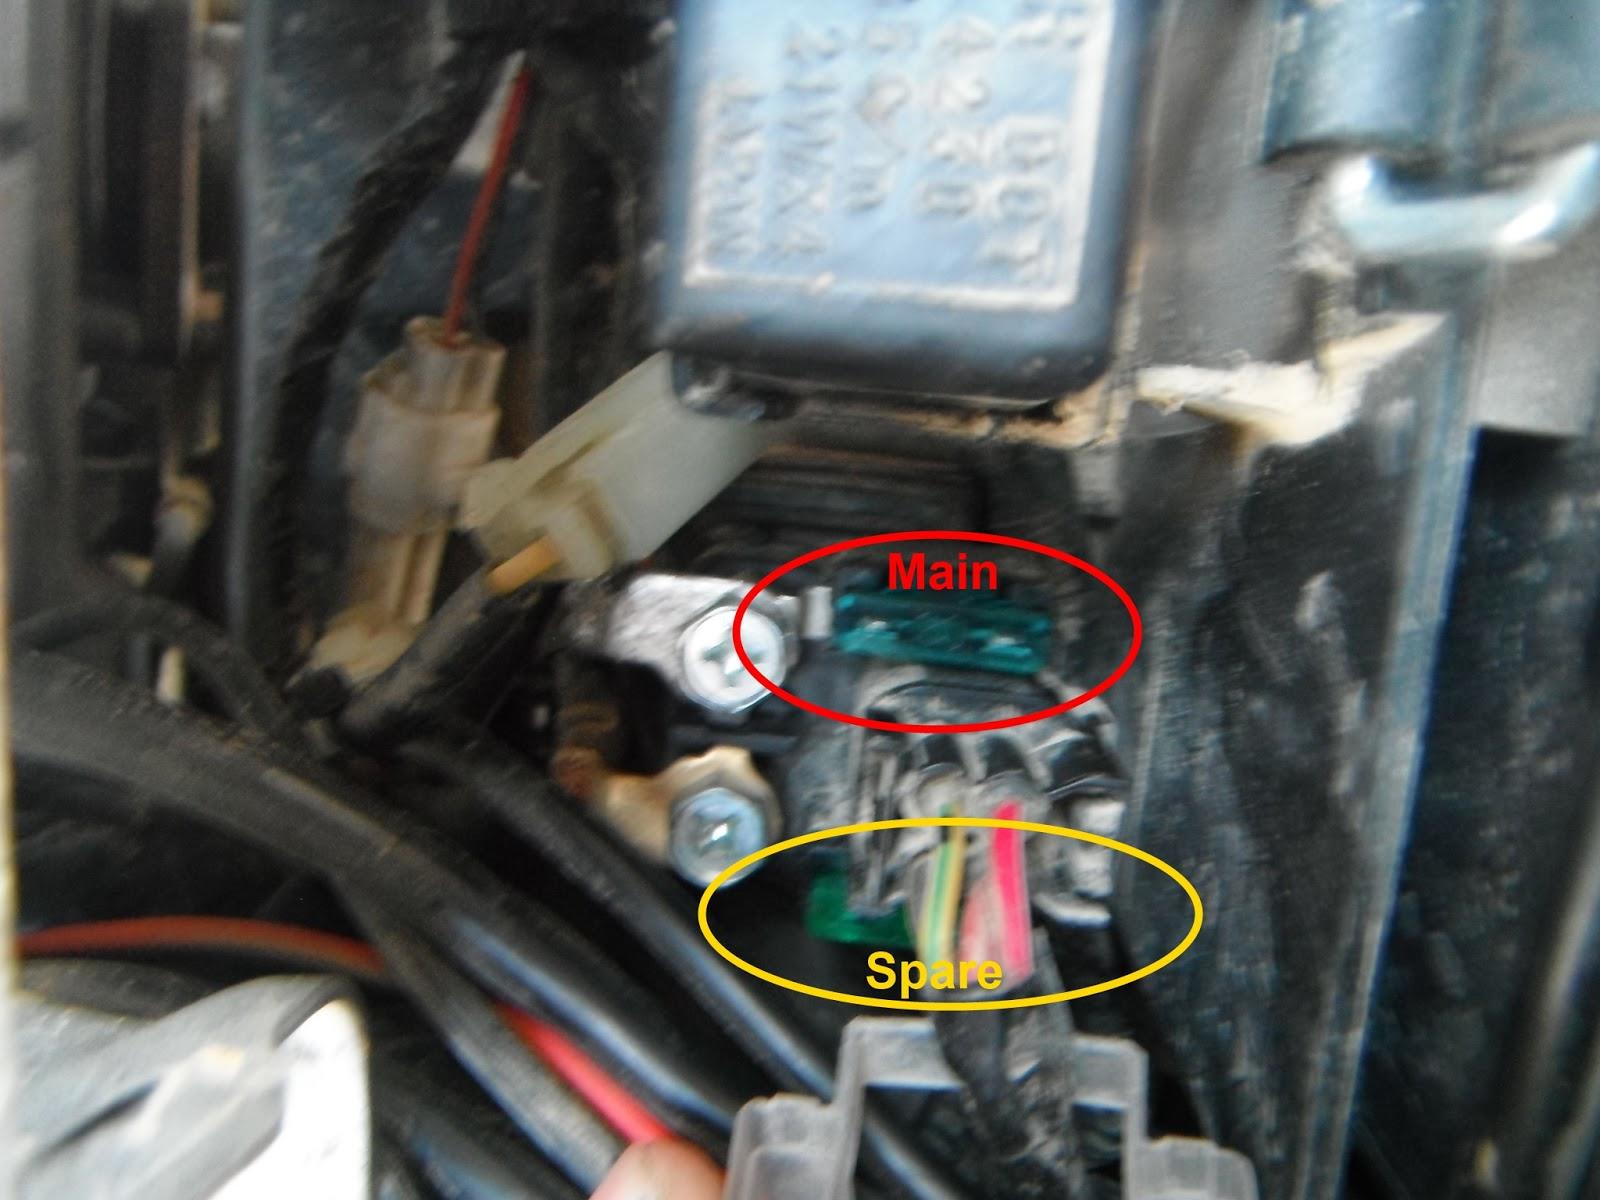 suzuki bandit fuse box location auto electrical wiring diagram u2022 rh 6weeks co uk  suzuki bandit fuse box